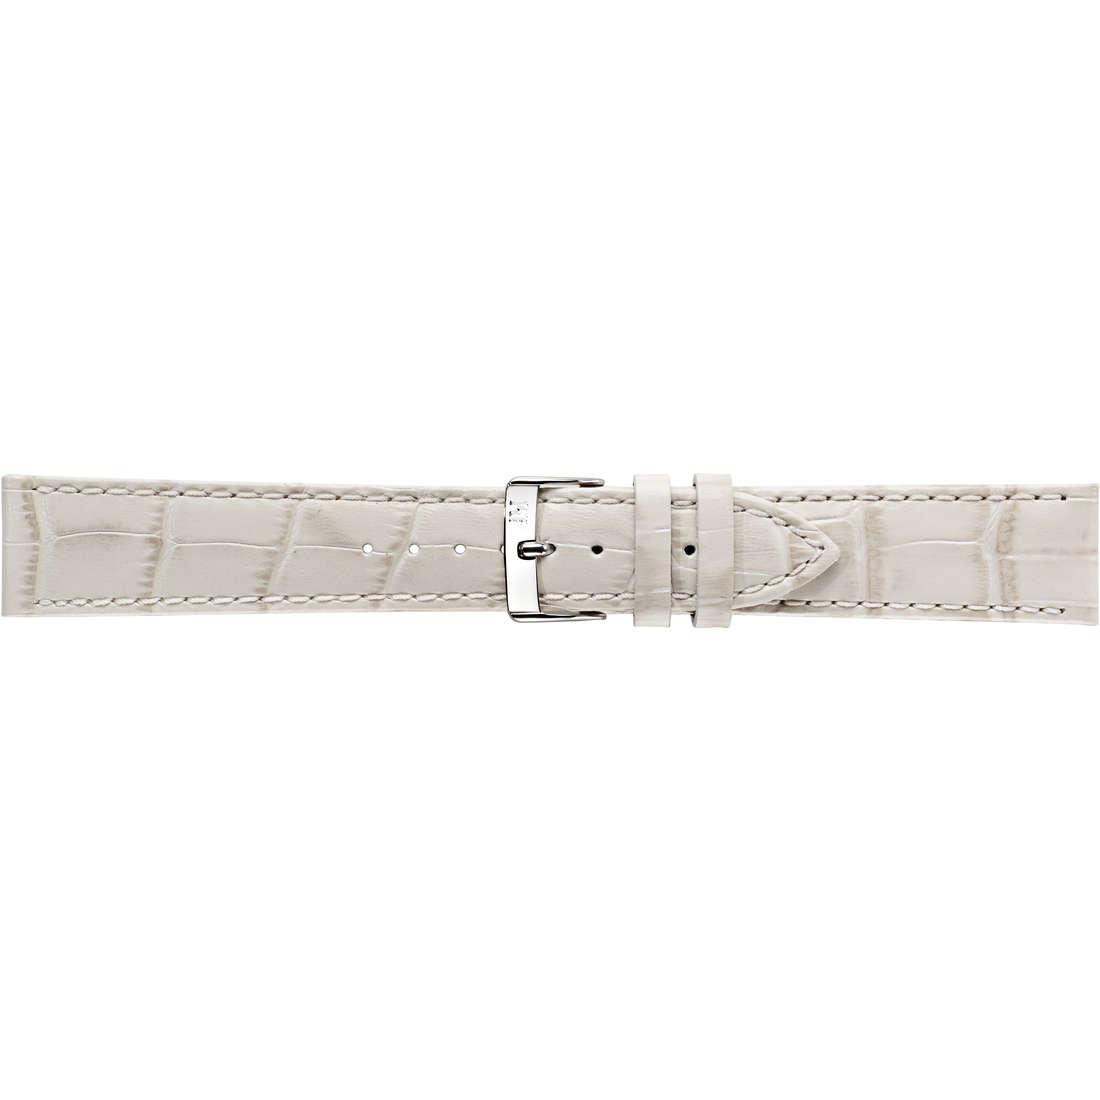 watch watch bands watch straps man Morellato Morellato 1930 A01X2269480026CR16